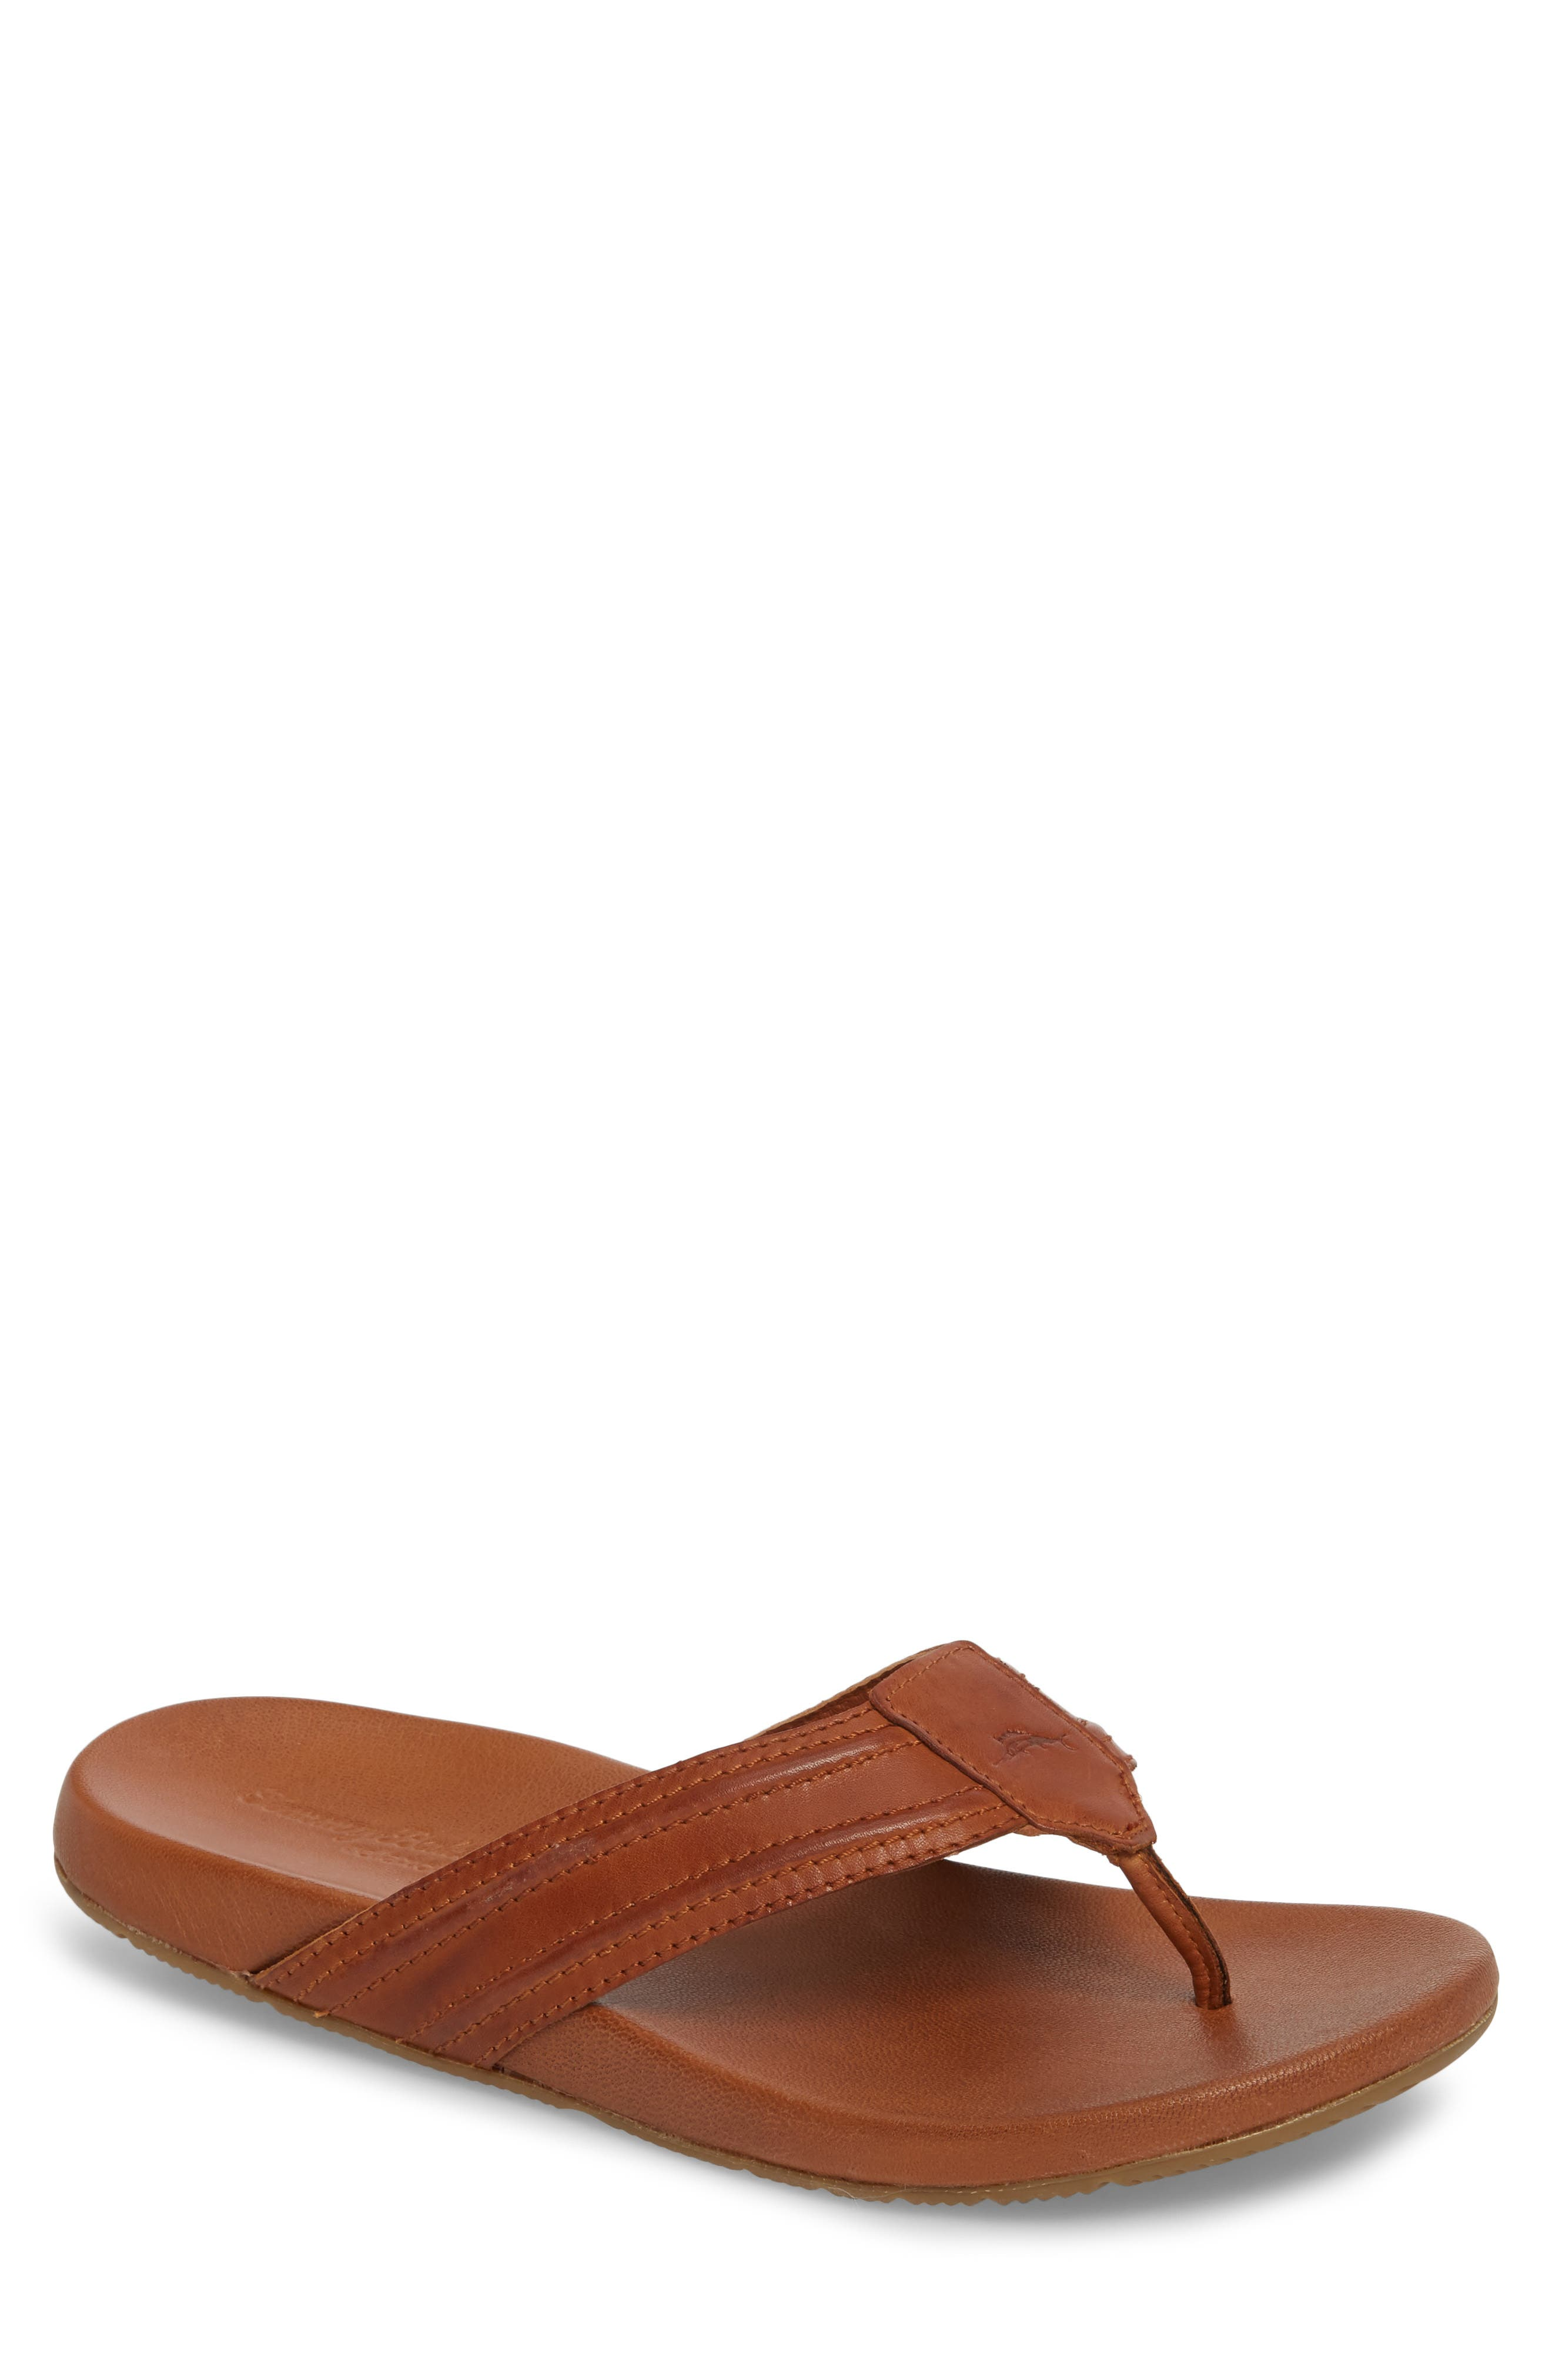 Mayaguana Flip Flop,                         Main,                         color, Tan Leather